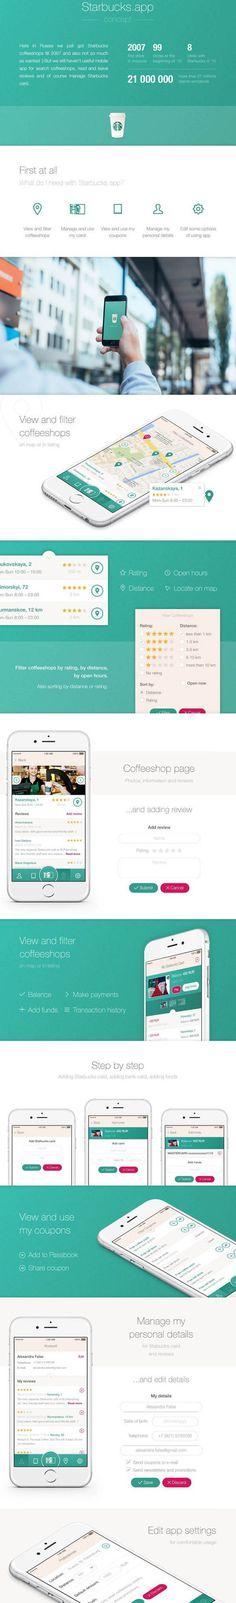 Starbucks iOS app by Alexandra False